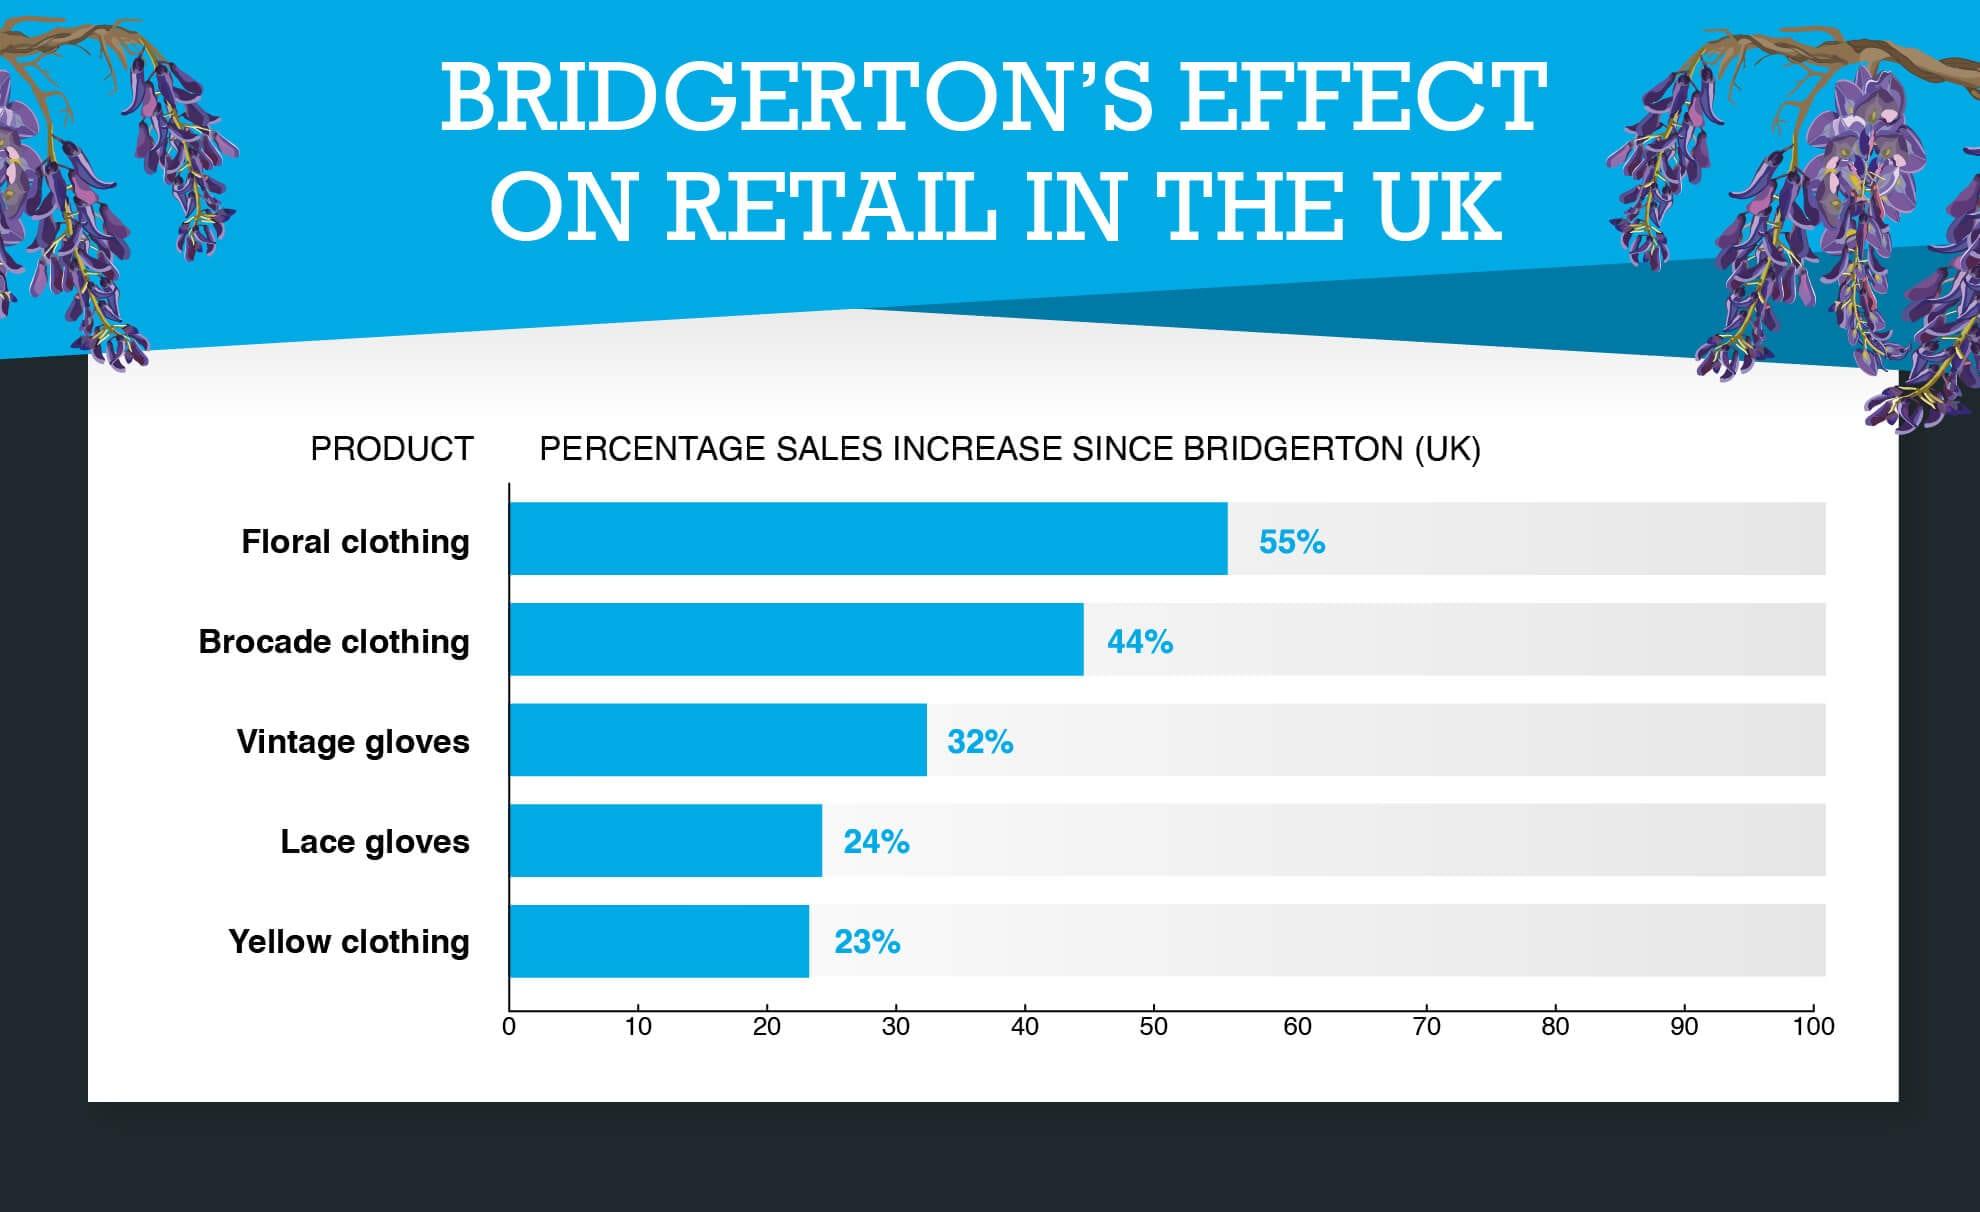 Bridgerton's Effect on Retail in the UK